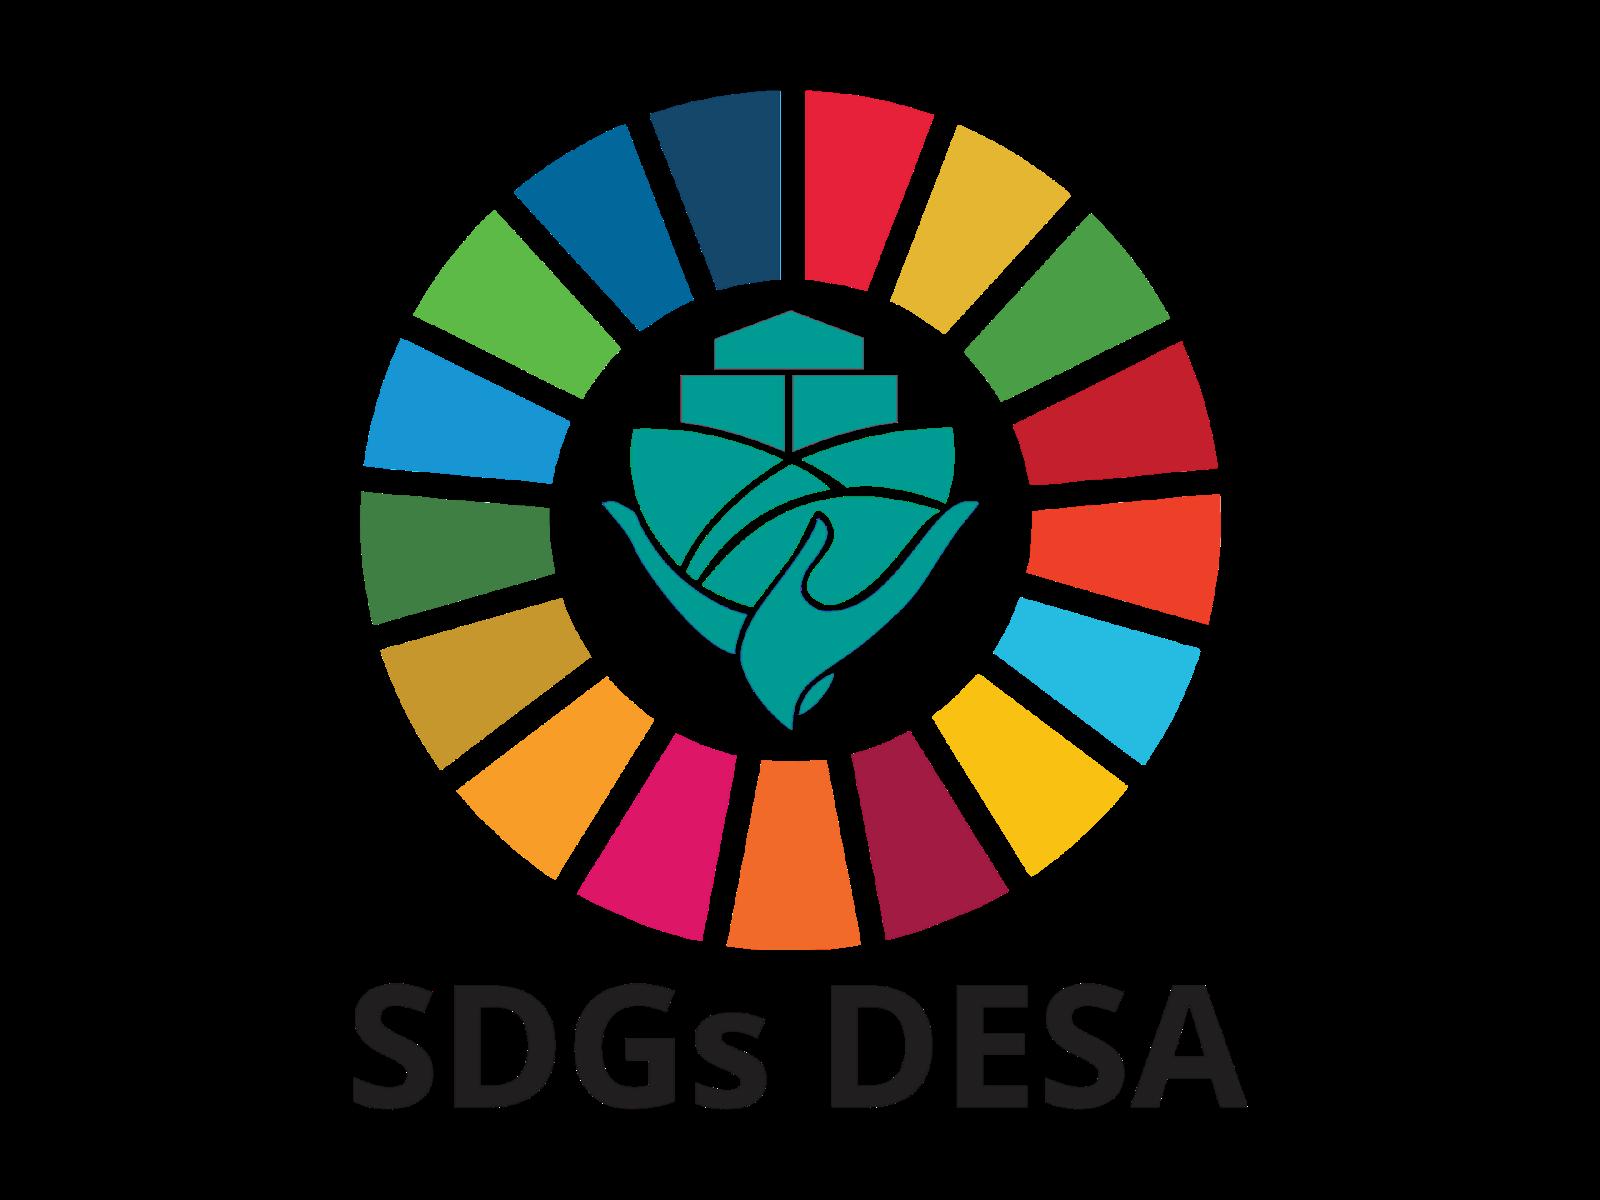 Logo SDGs Desa Format PNG